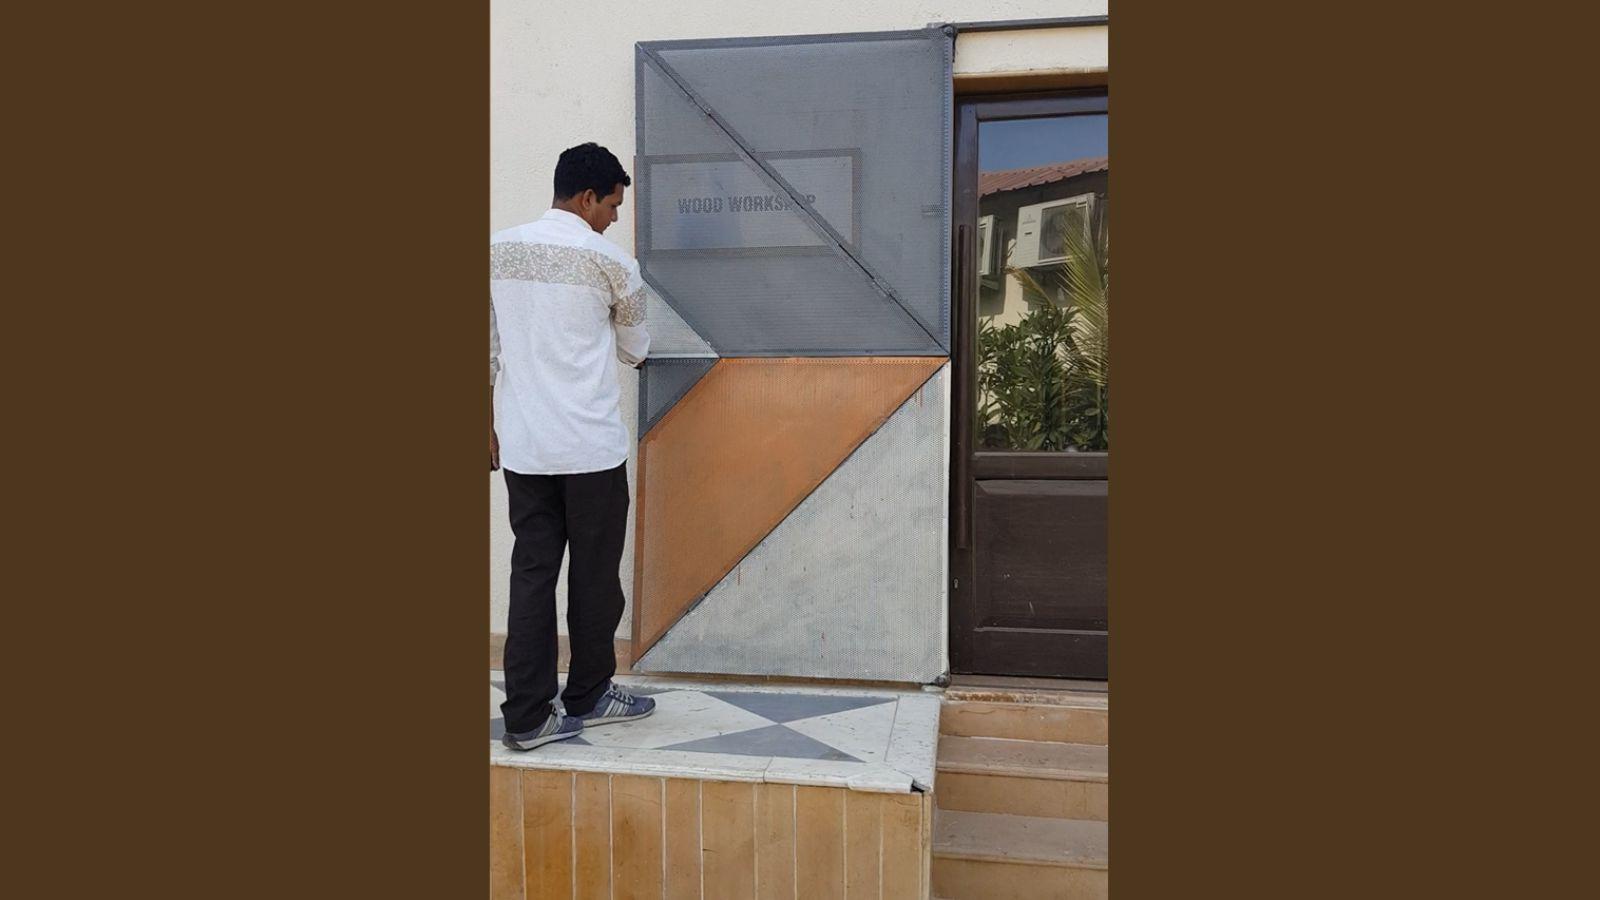 Innovative Door developed at UID Image